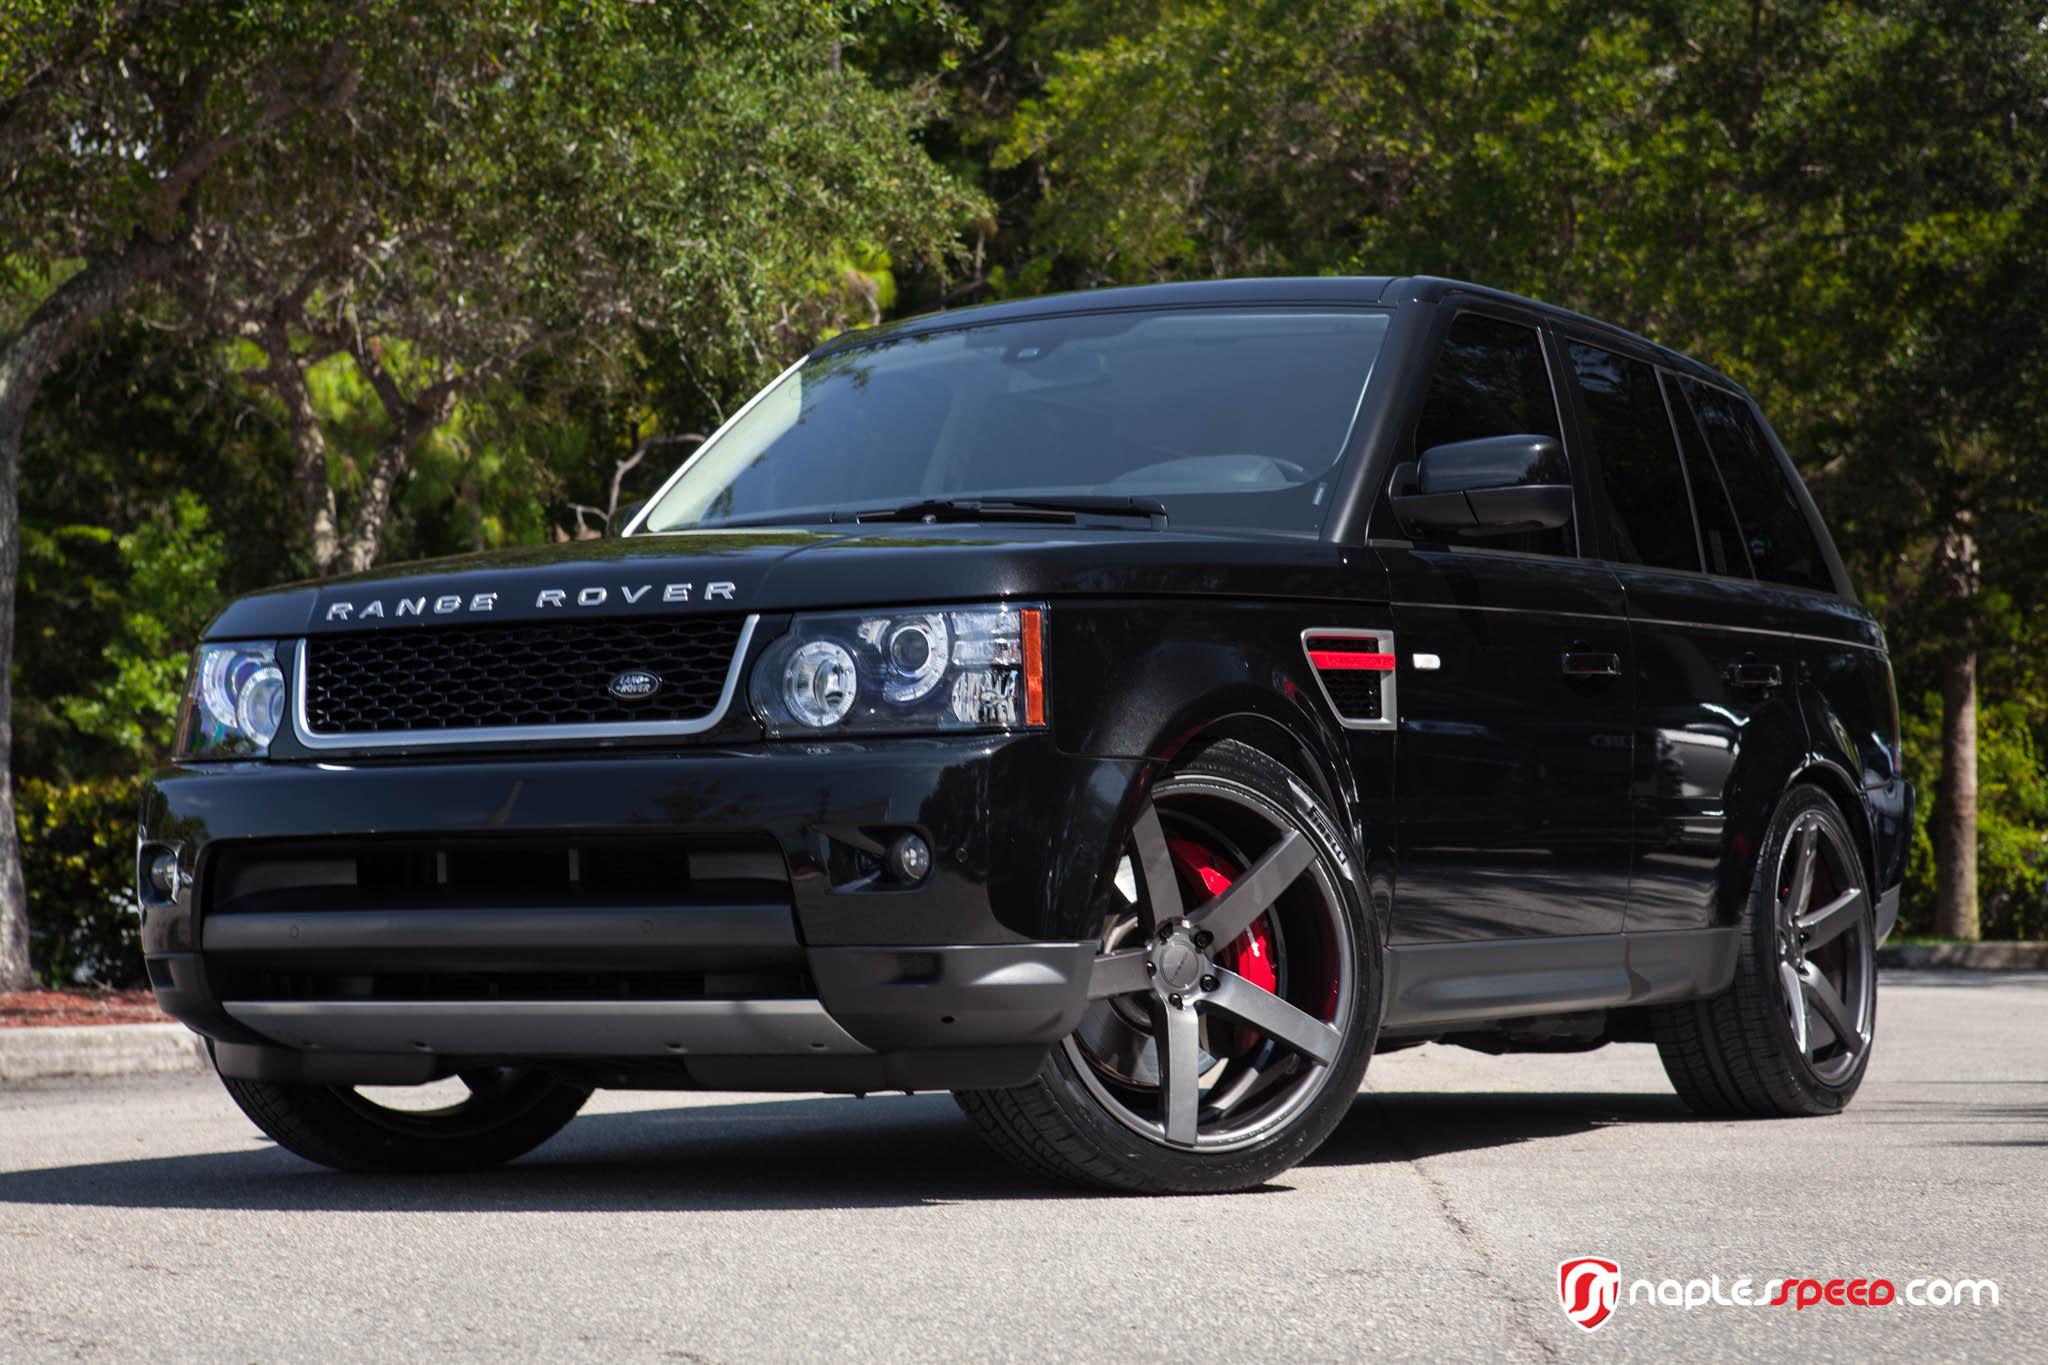 Range Rover Sport Joins TeamVossen – Advanced Automotive Accessories